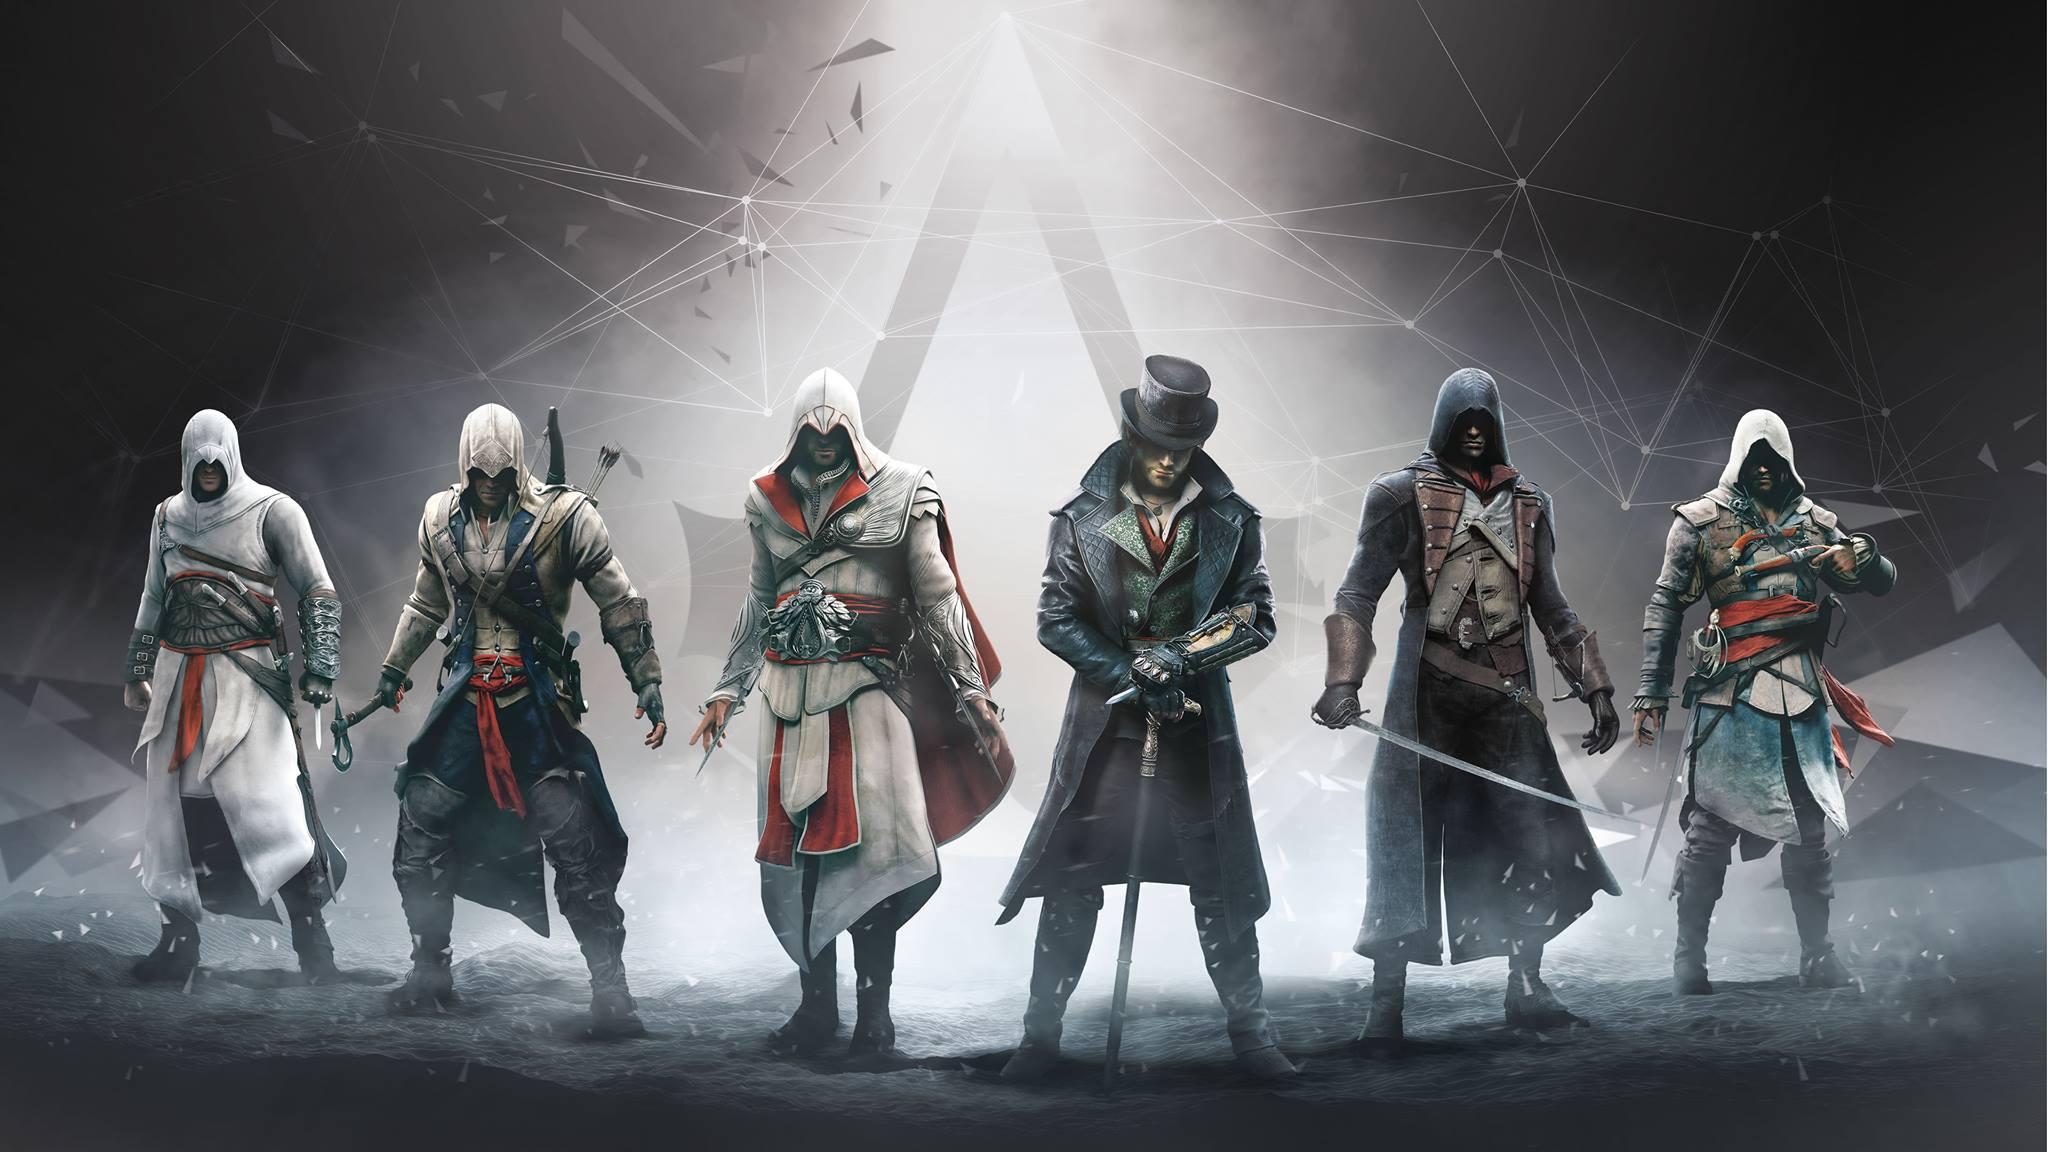 Интересности об Assassin's Creed Syndicate - Изображение 6